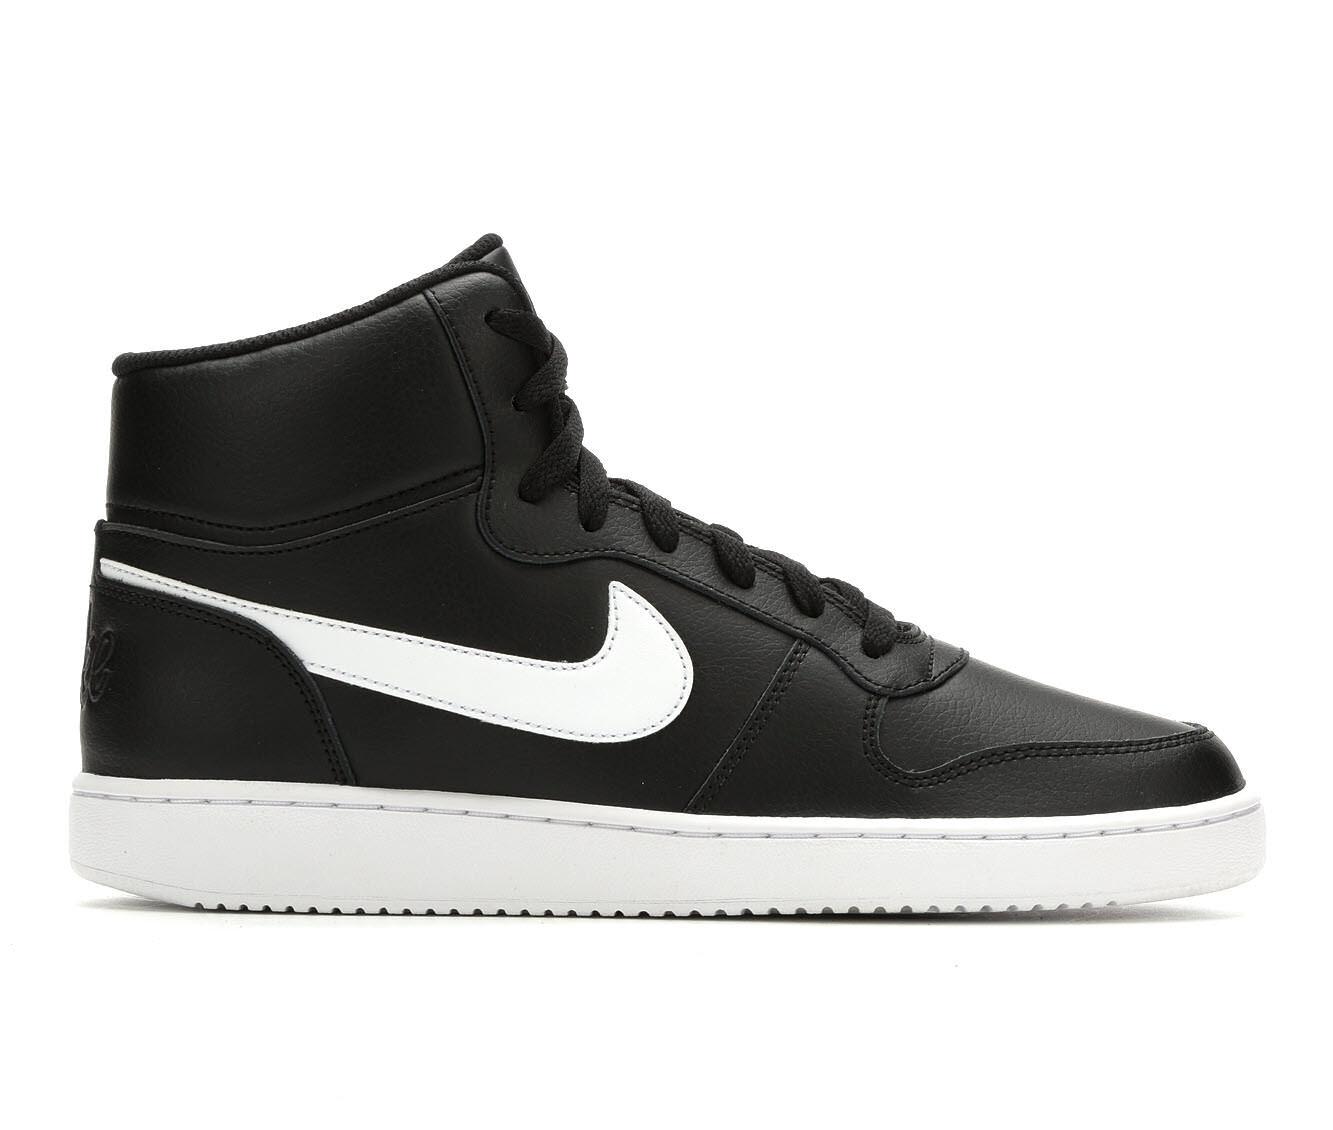 Men's Nike Ebernon Mid Sneakers Blk/Wht